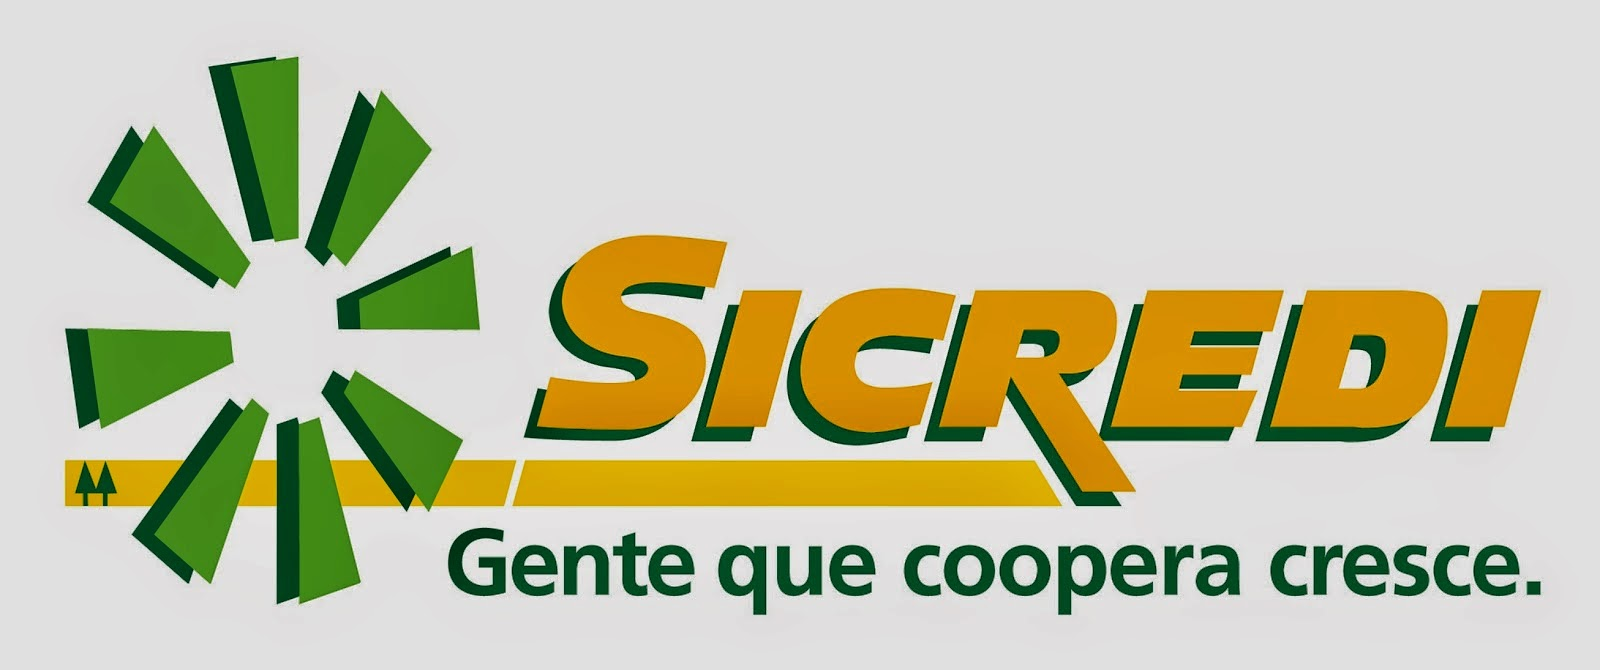 SICREDI GENTE QUE COOPERA CARESCE..